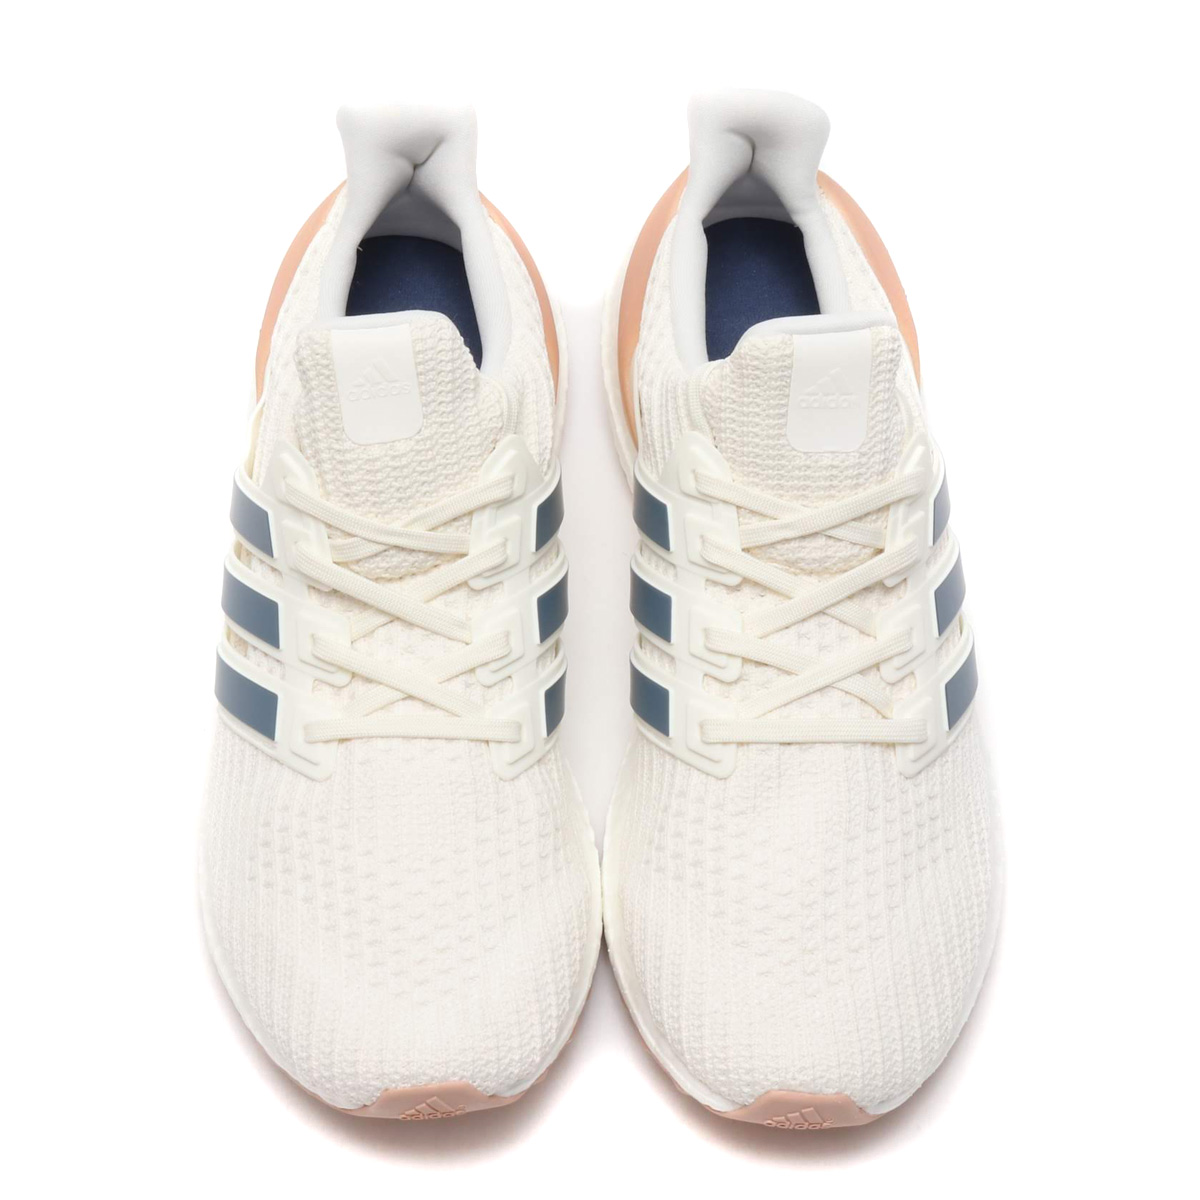 0b9f4969f8da9 adidas UltraBOOST (Adidas ultra boost) cloud white F18  technical center  ink F16  Ashe pearl S18 18FW-I